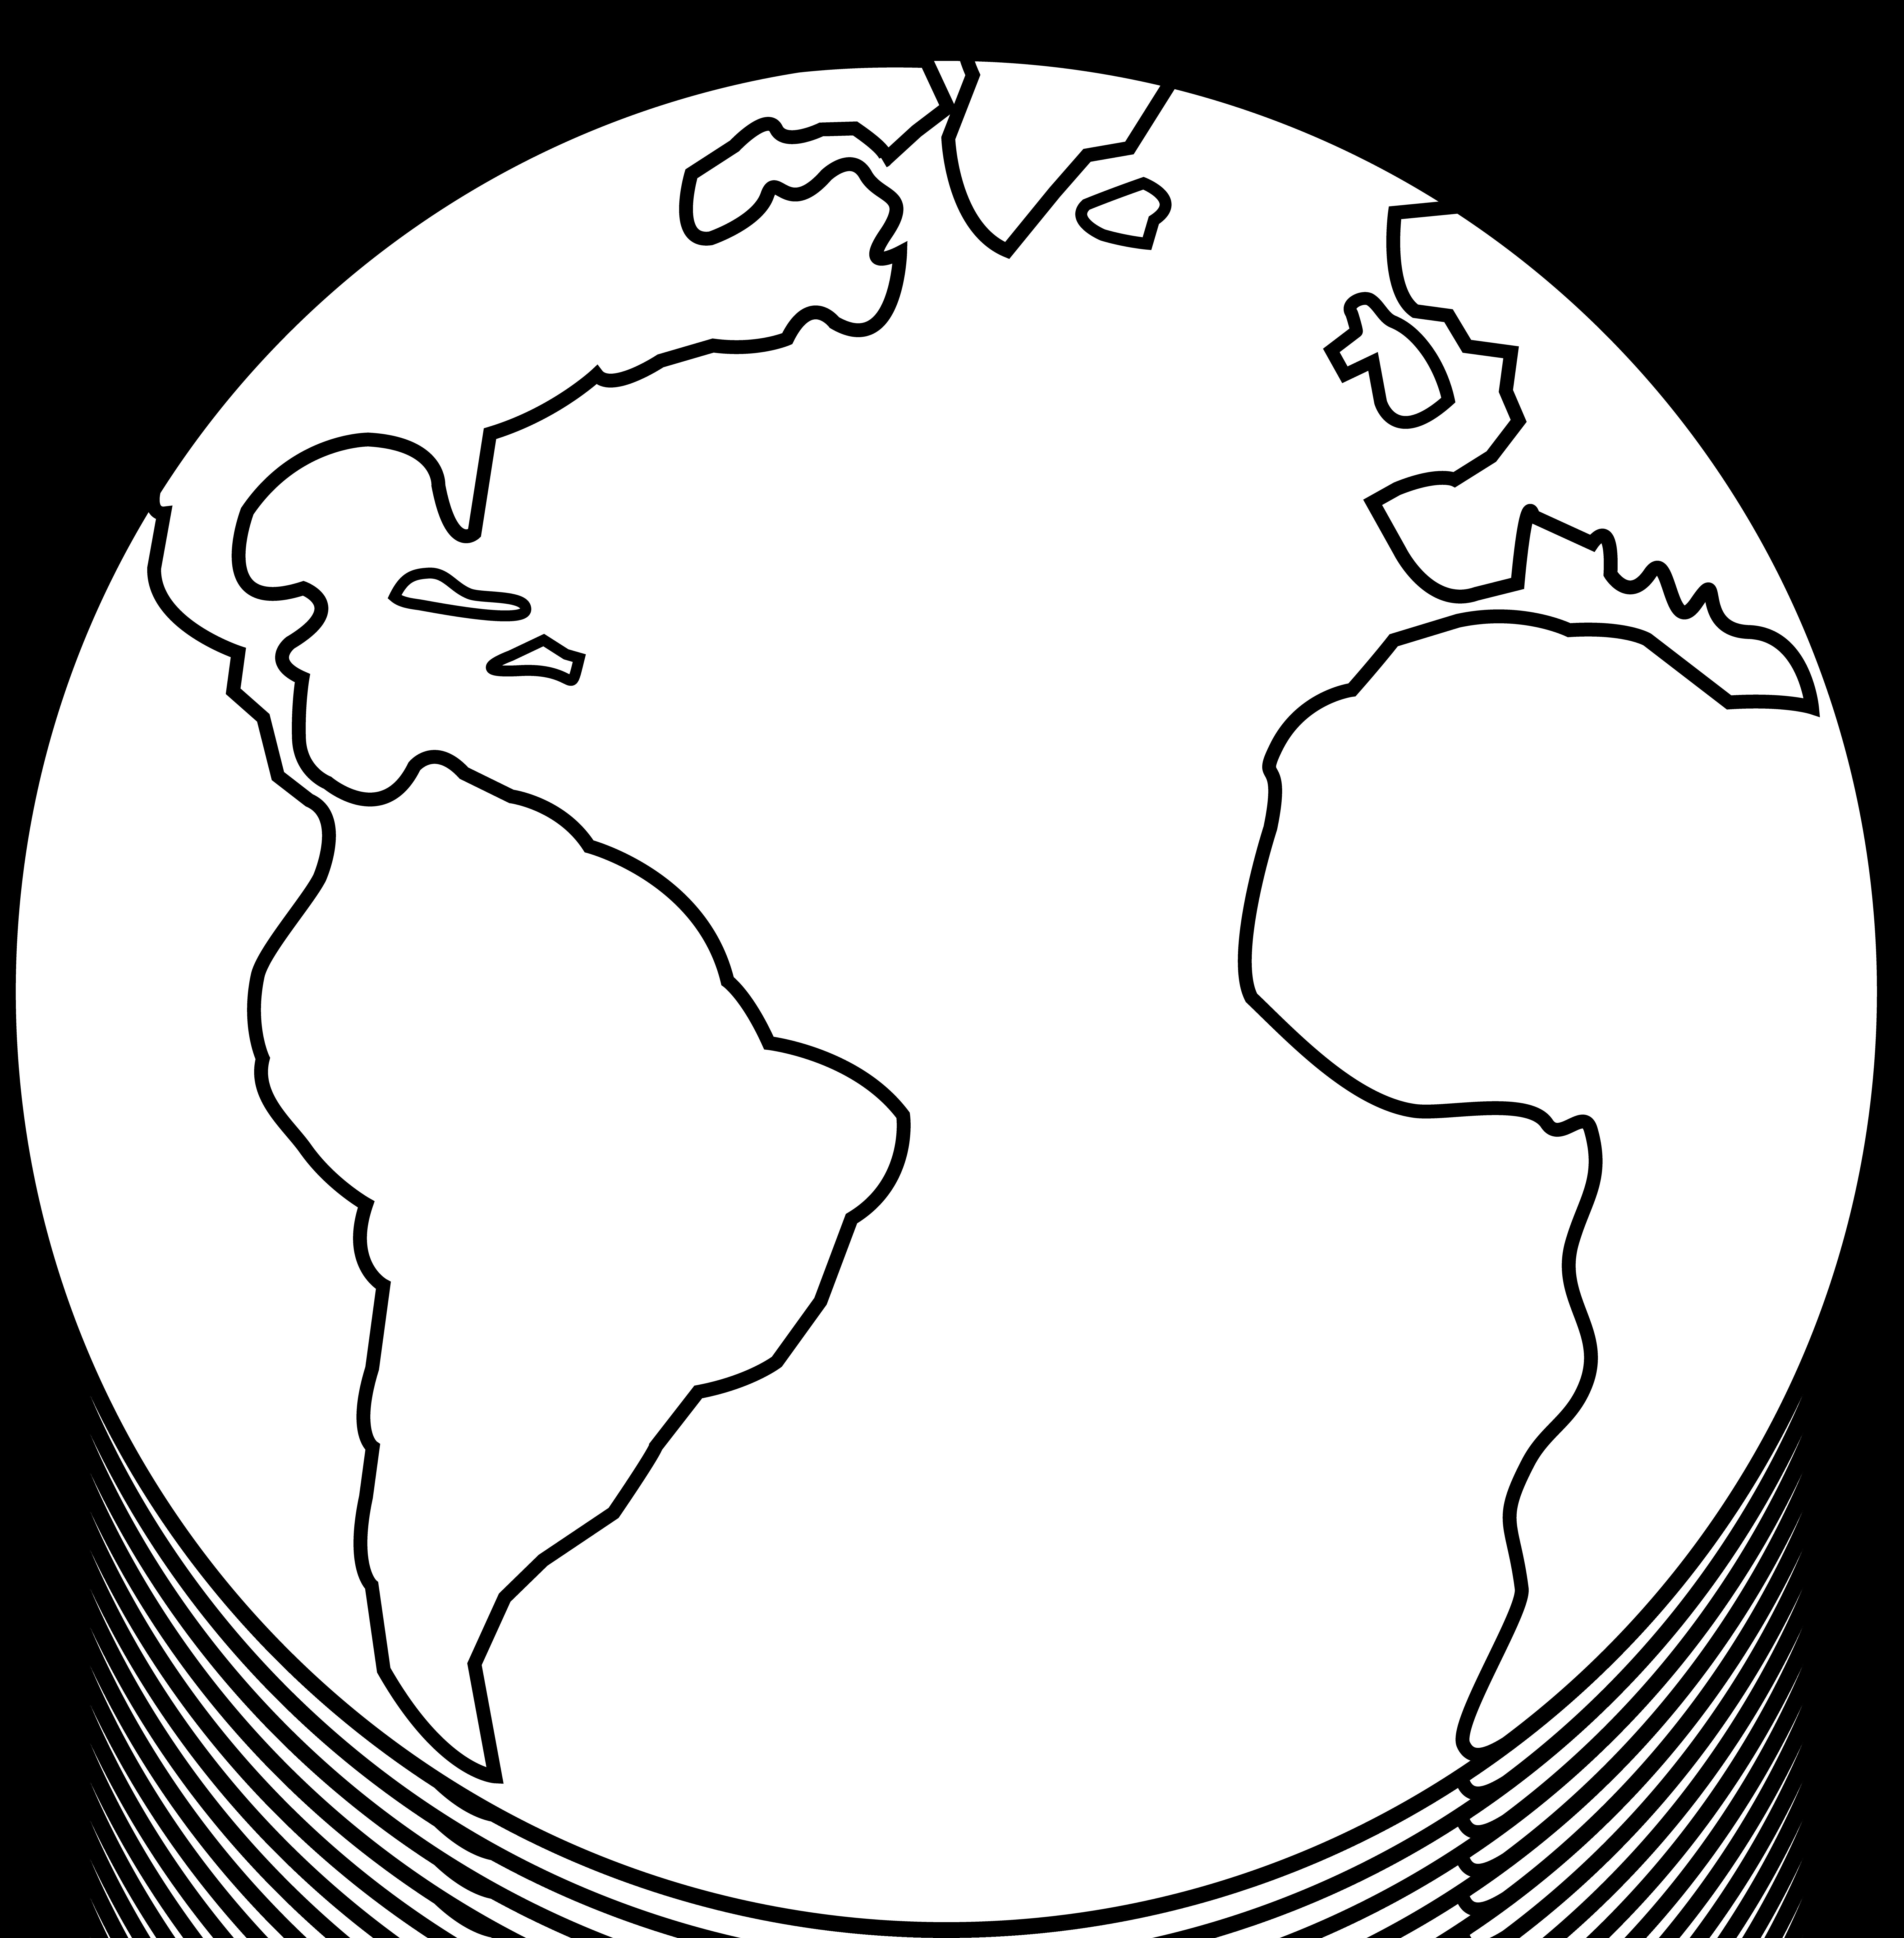 Colorable Earth Line Art